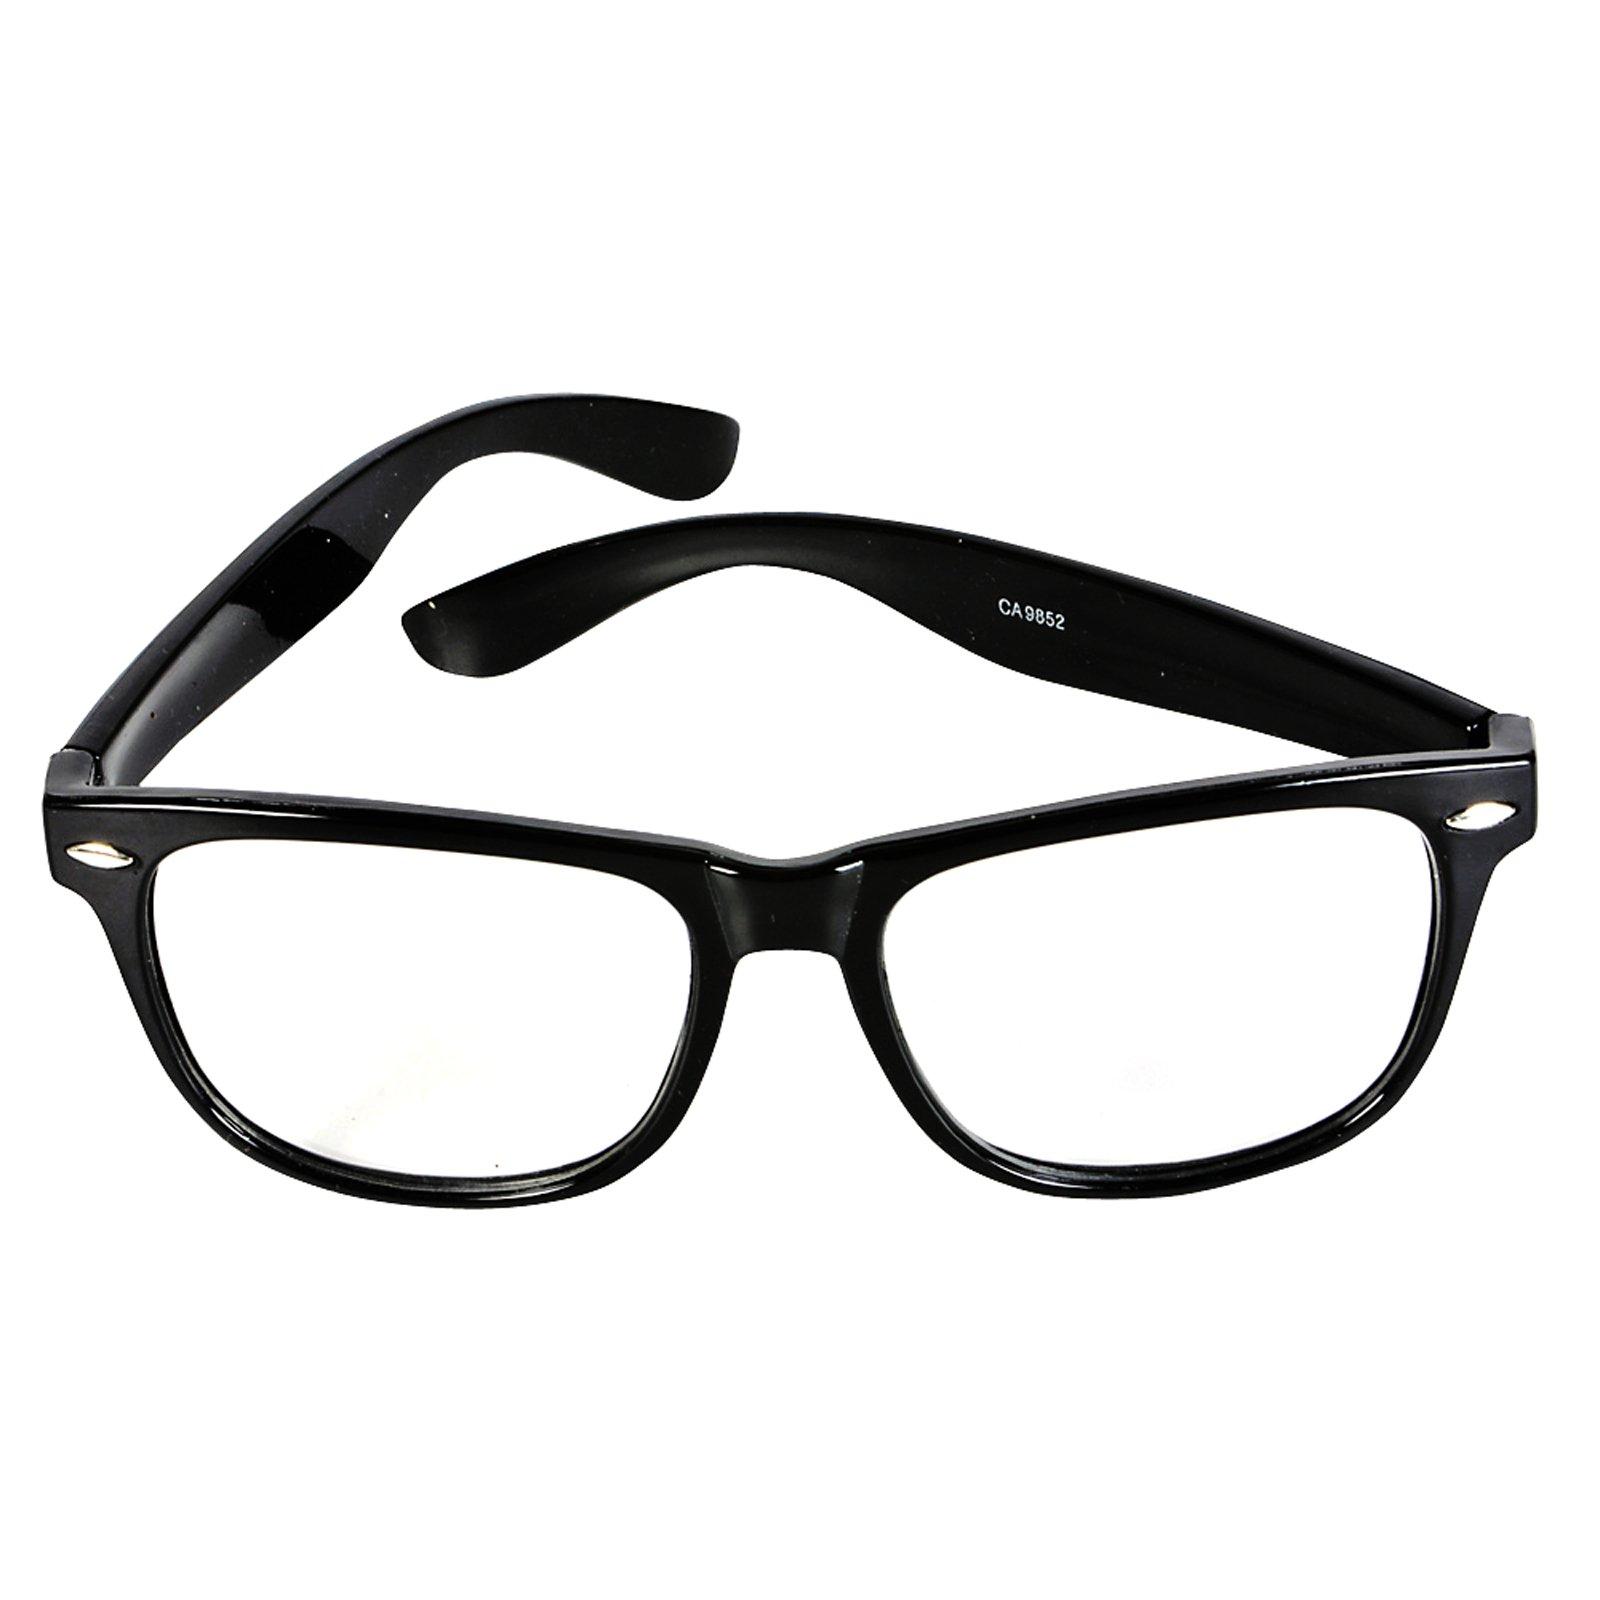 1600x1600 Glasses Clipart Clip Art Nerd Ut7l